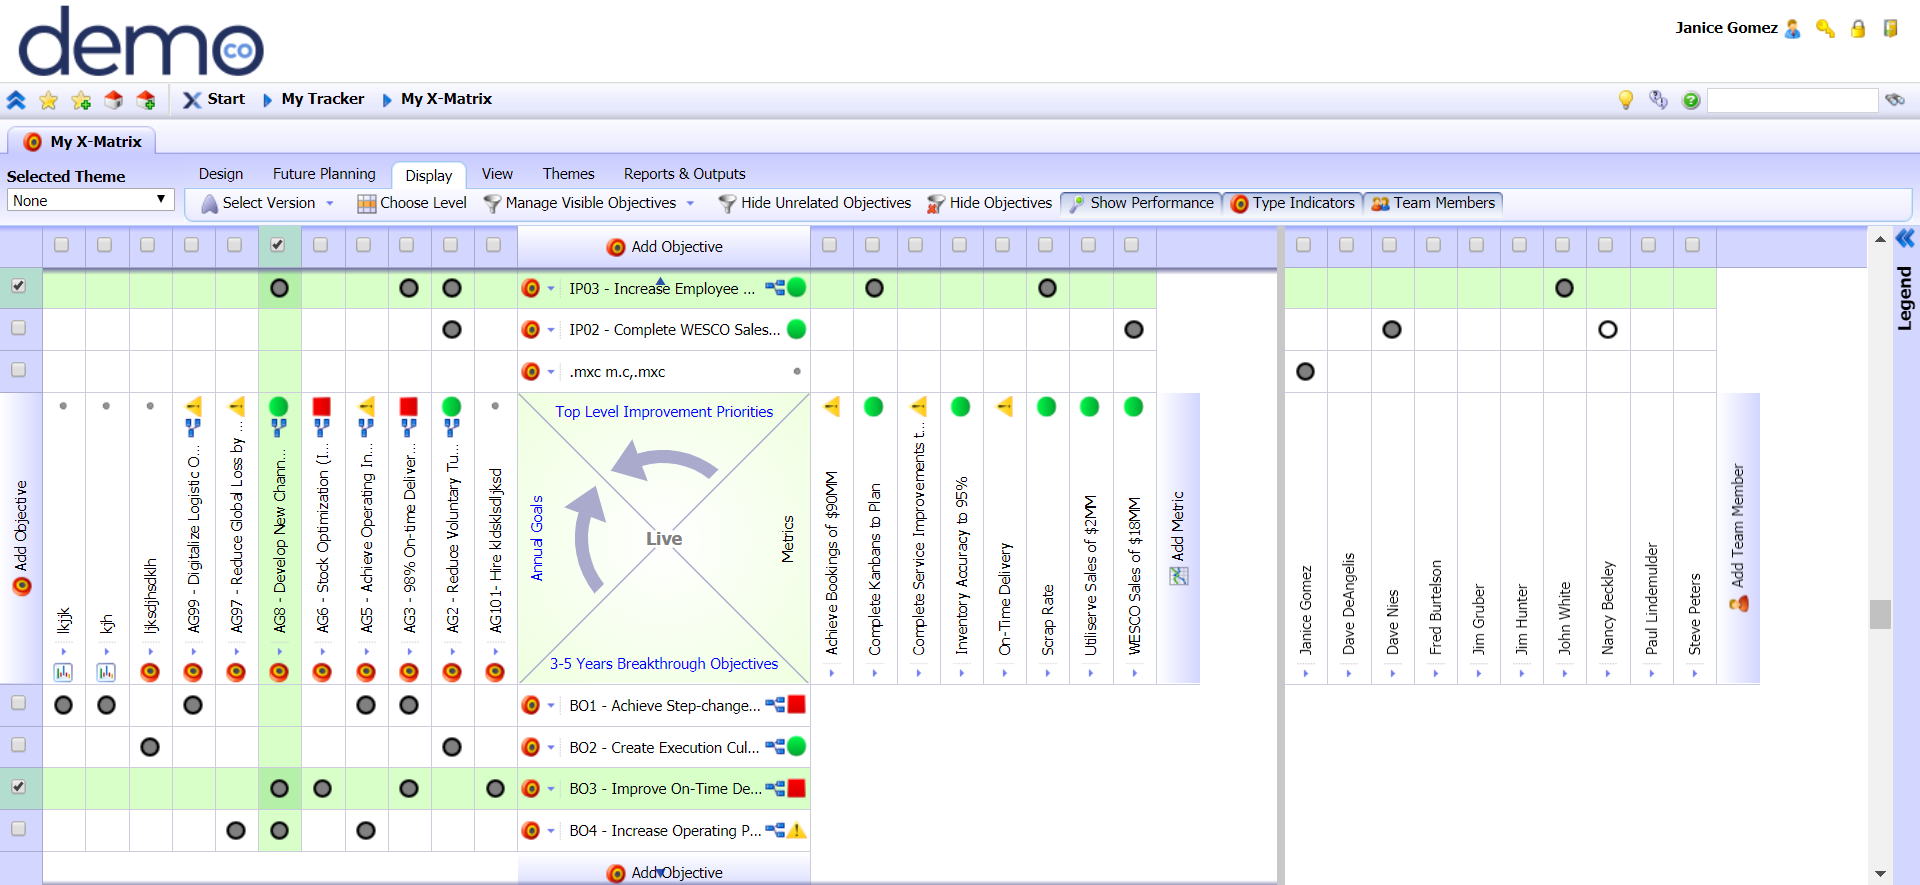 hoshin strategy execution software drilldown screenshot 2